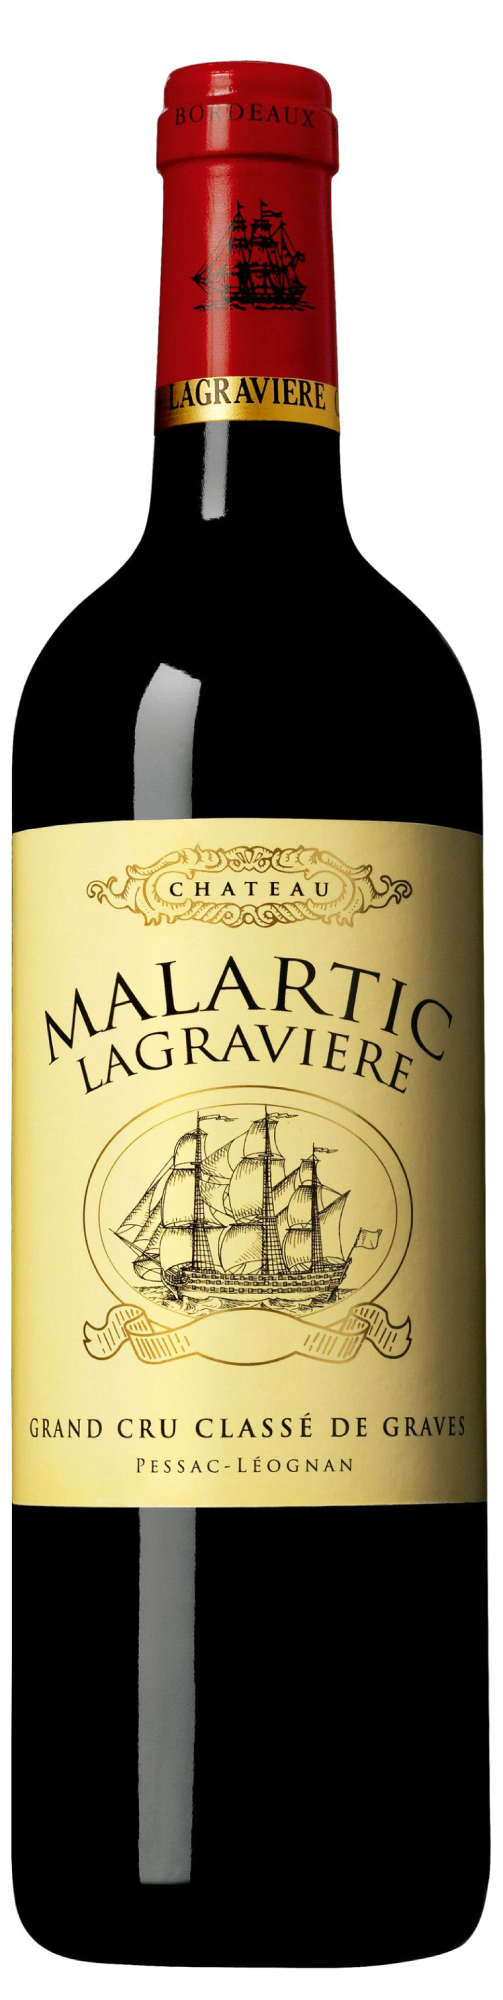 Chateau Malartic Lagraviere Rouge - winewine магазин склад